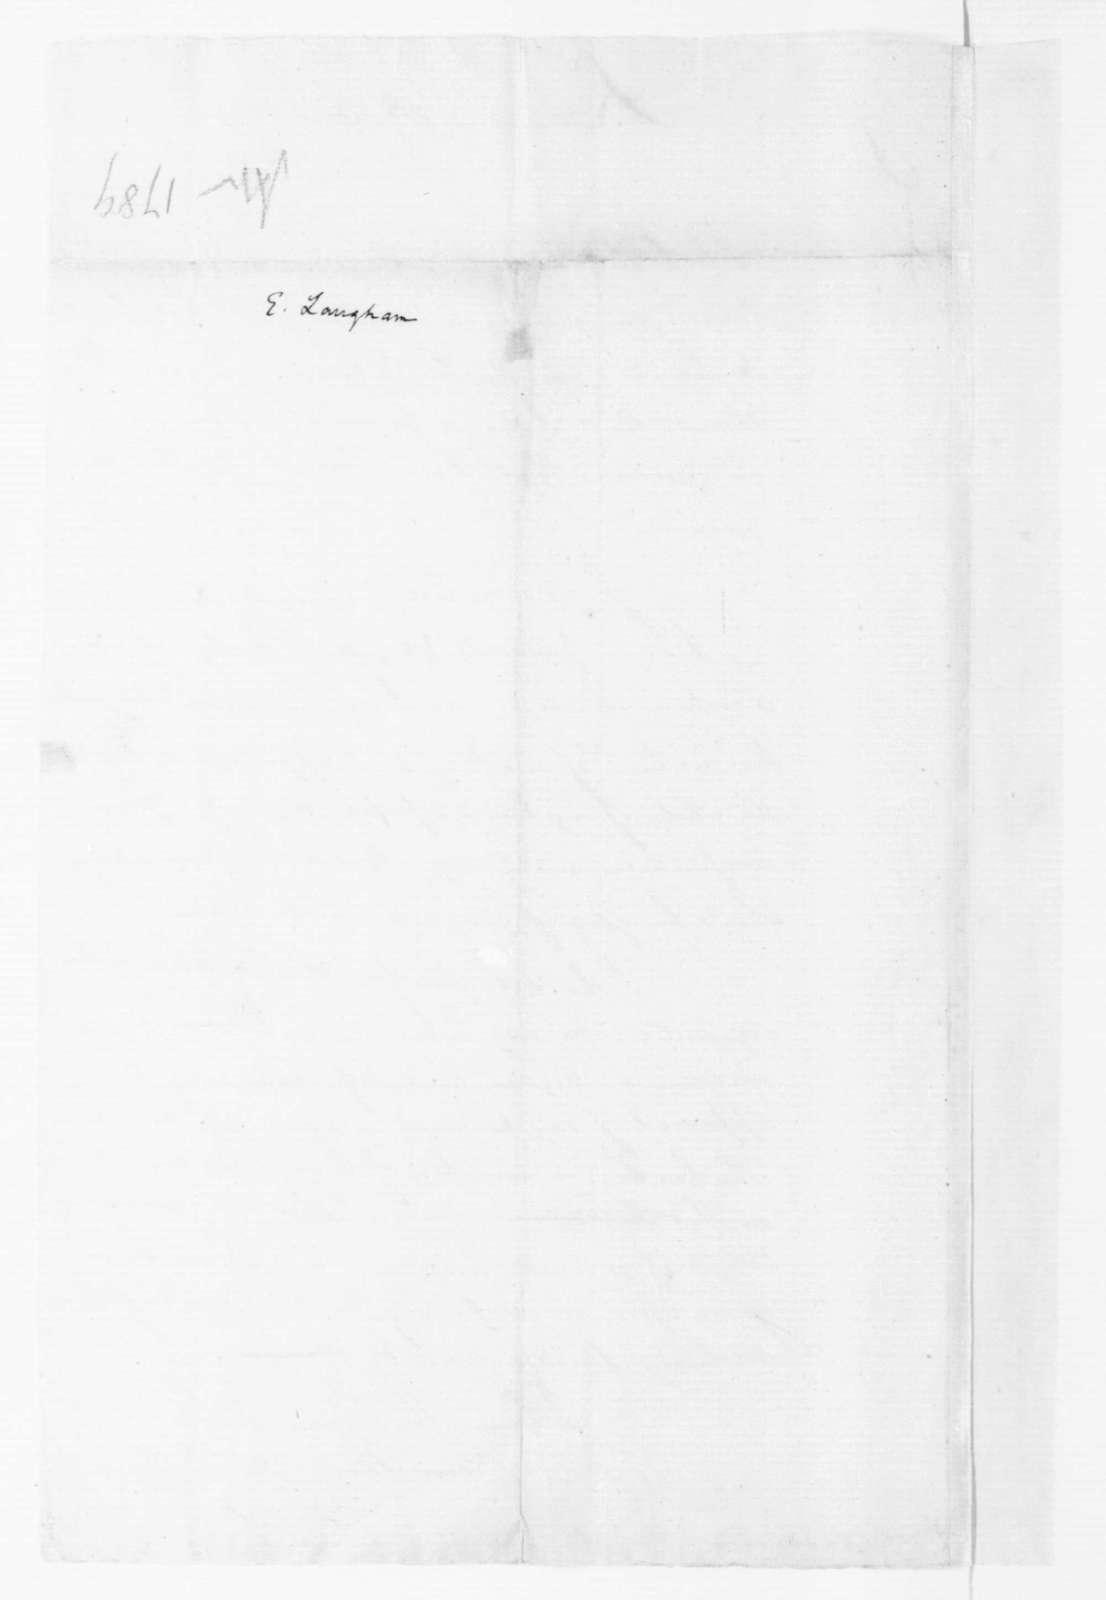 Elias Langham to James Madison, April 11, 1789.